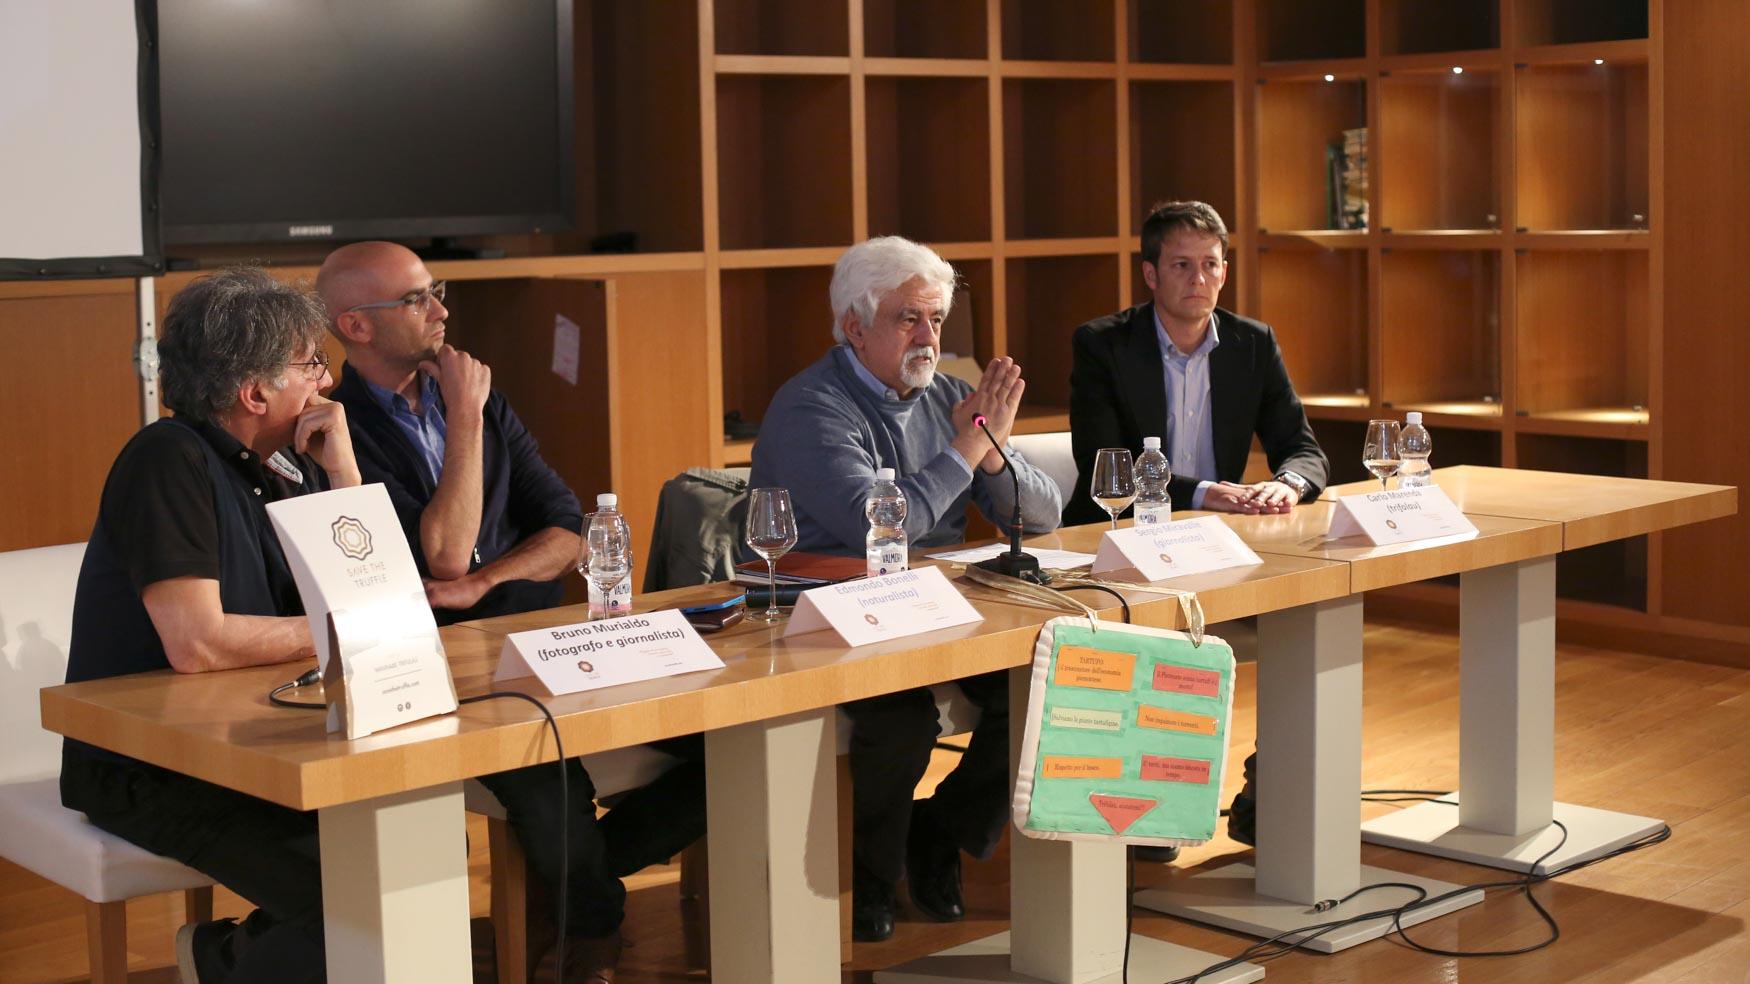 In ordine: Bruno Murialdo, Edmondo Bonelli, Sergio Miravalle, Carlo Marenda